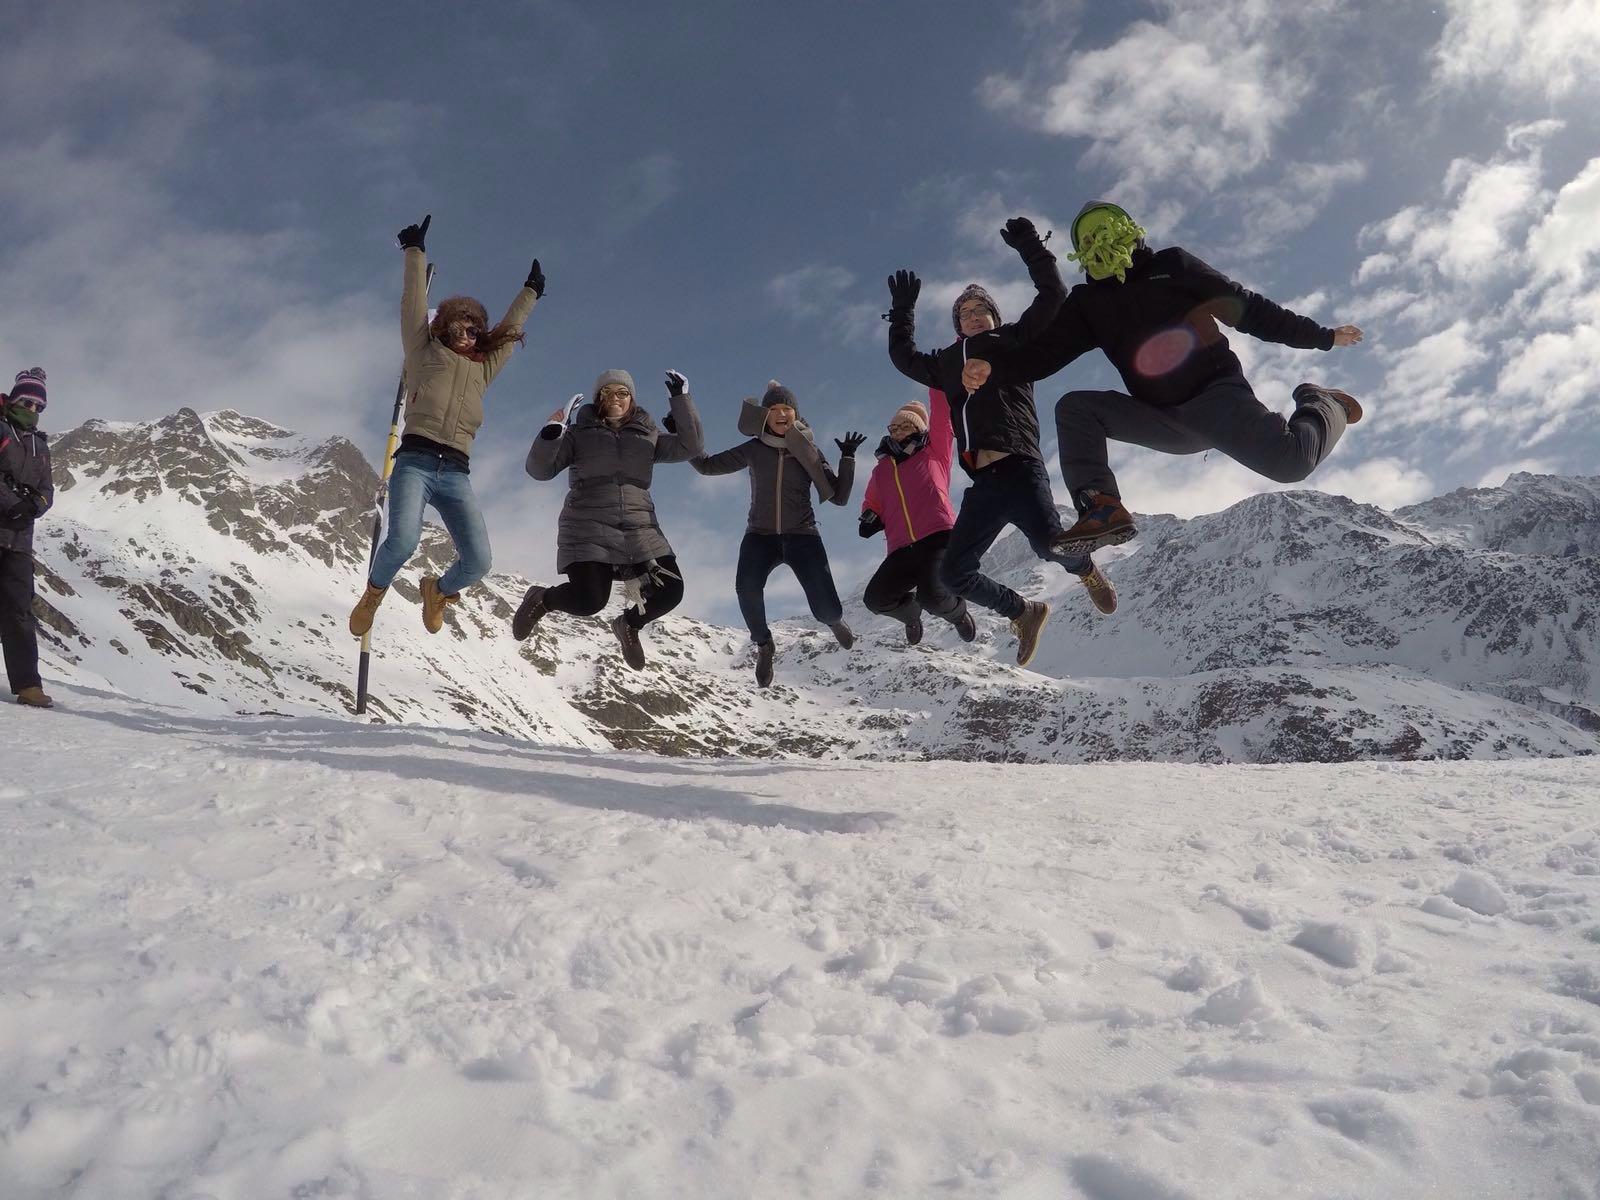 #inLombardia365, prima tappa in Valtellina